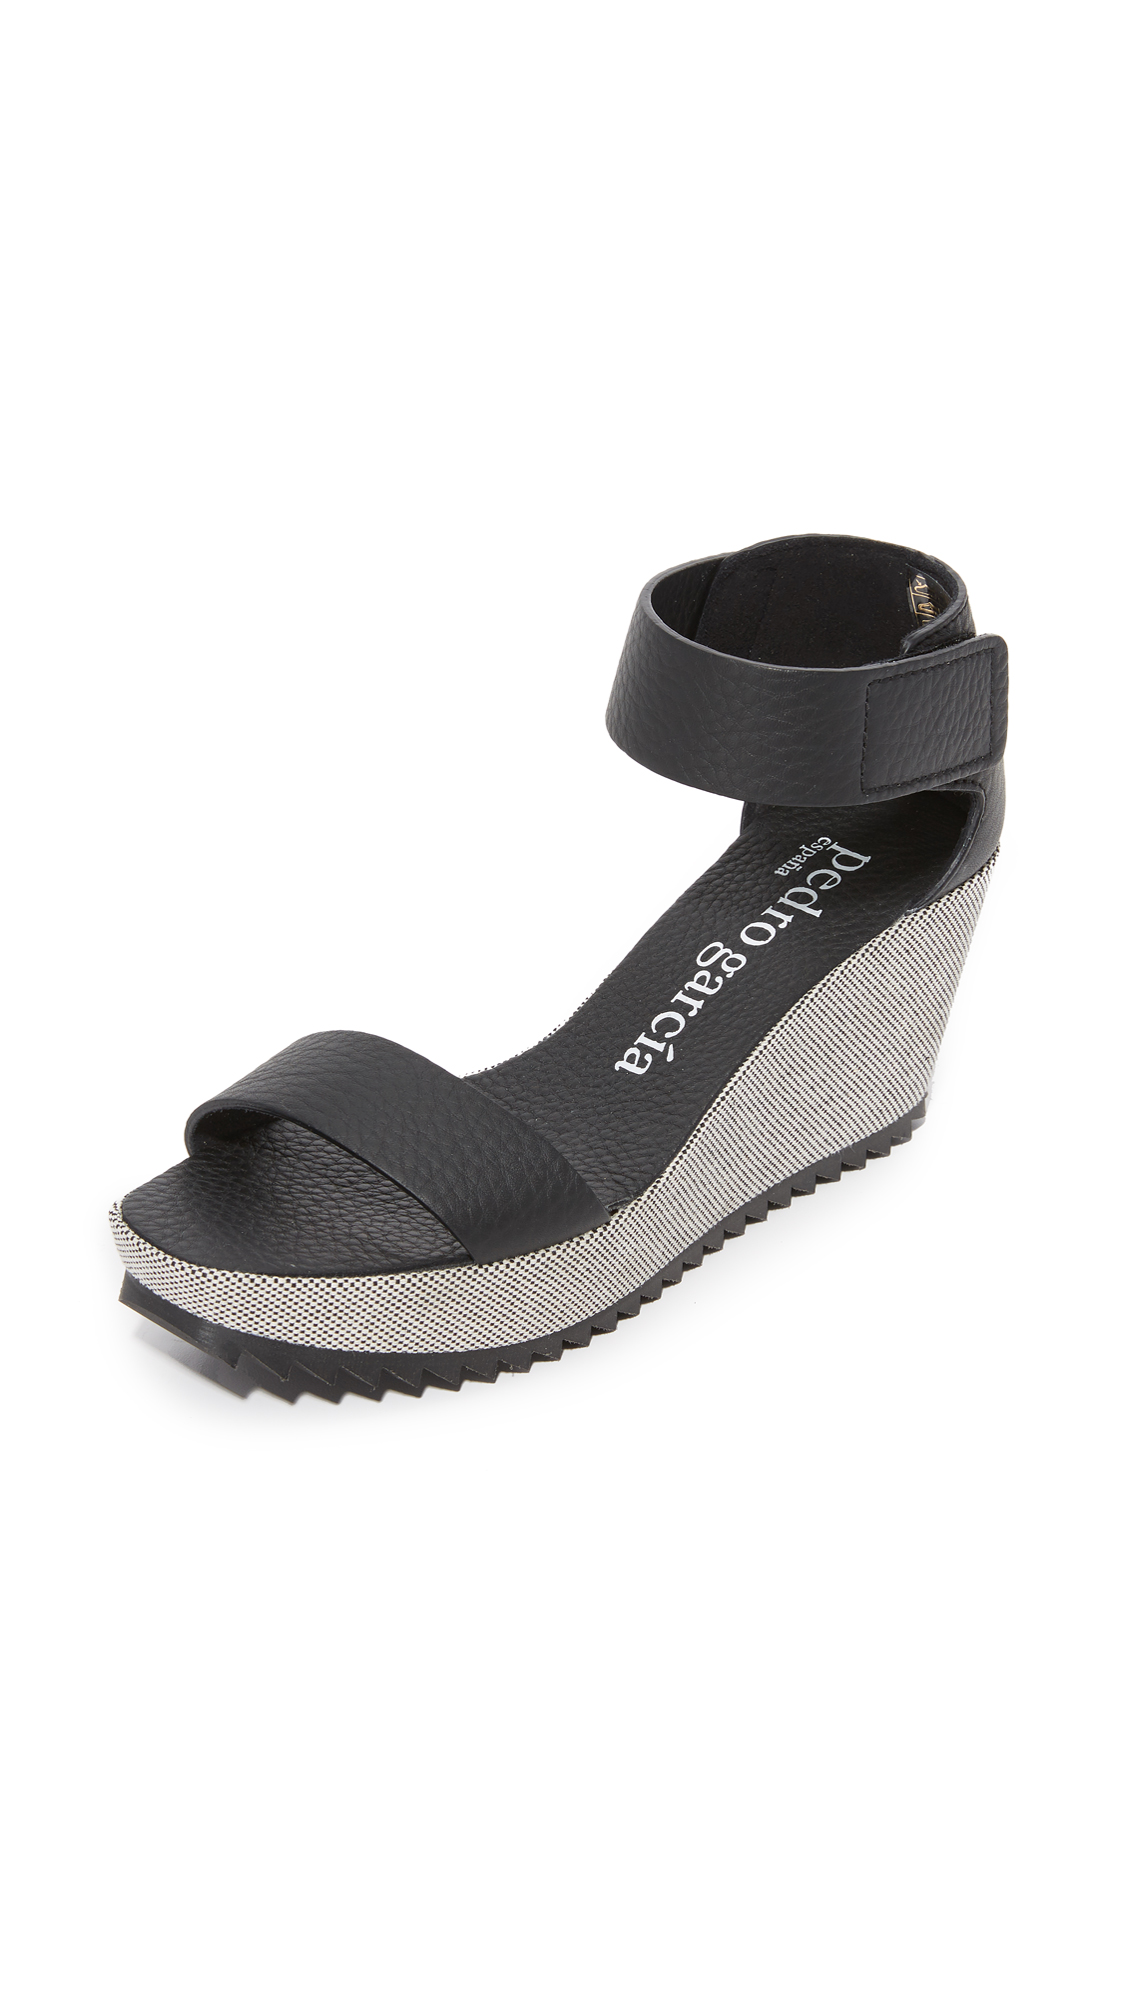 Pedro Garcia Fidelia Wedge Sandals - Black